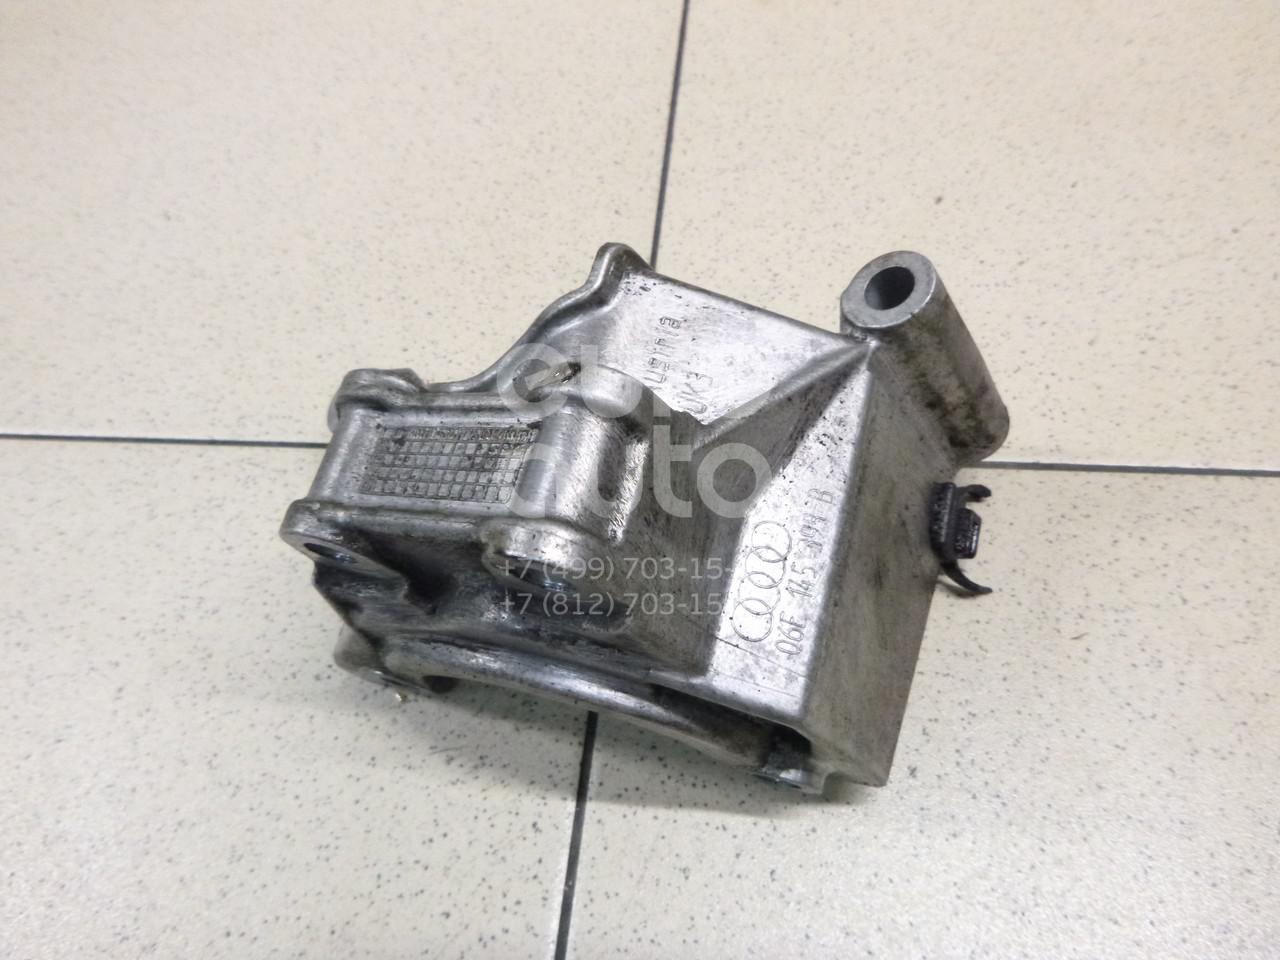 Купить Кронштейн гидроусилителя Audi A6 [C6, 4F] 2004-2011; (06E145393B)